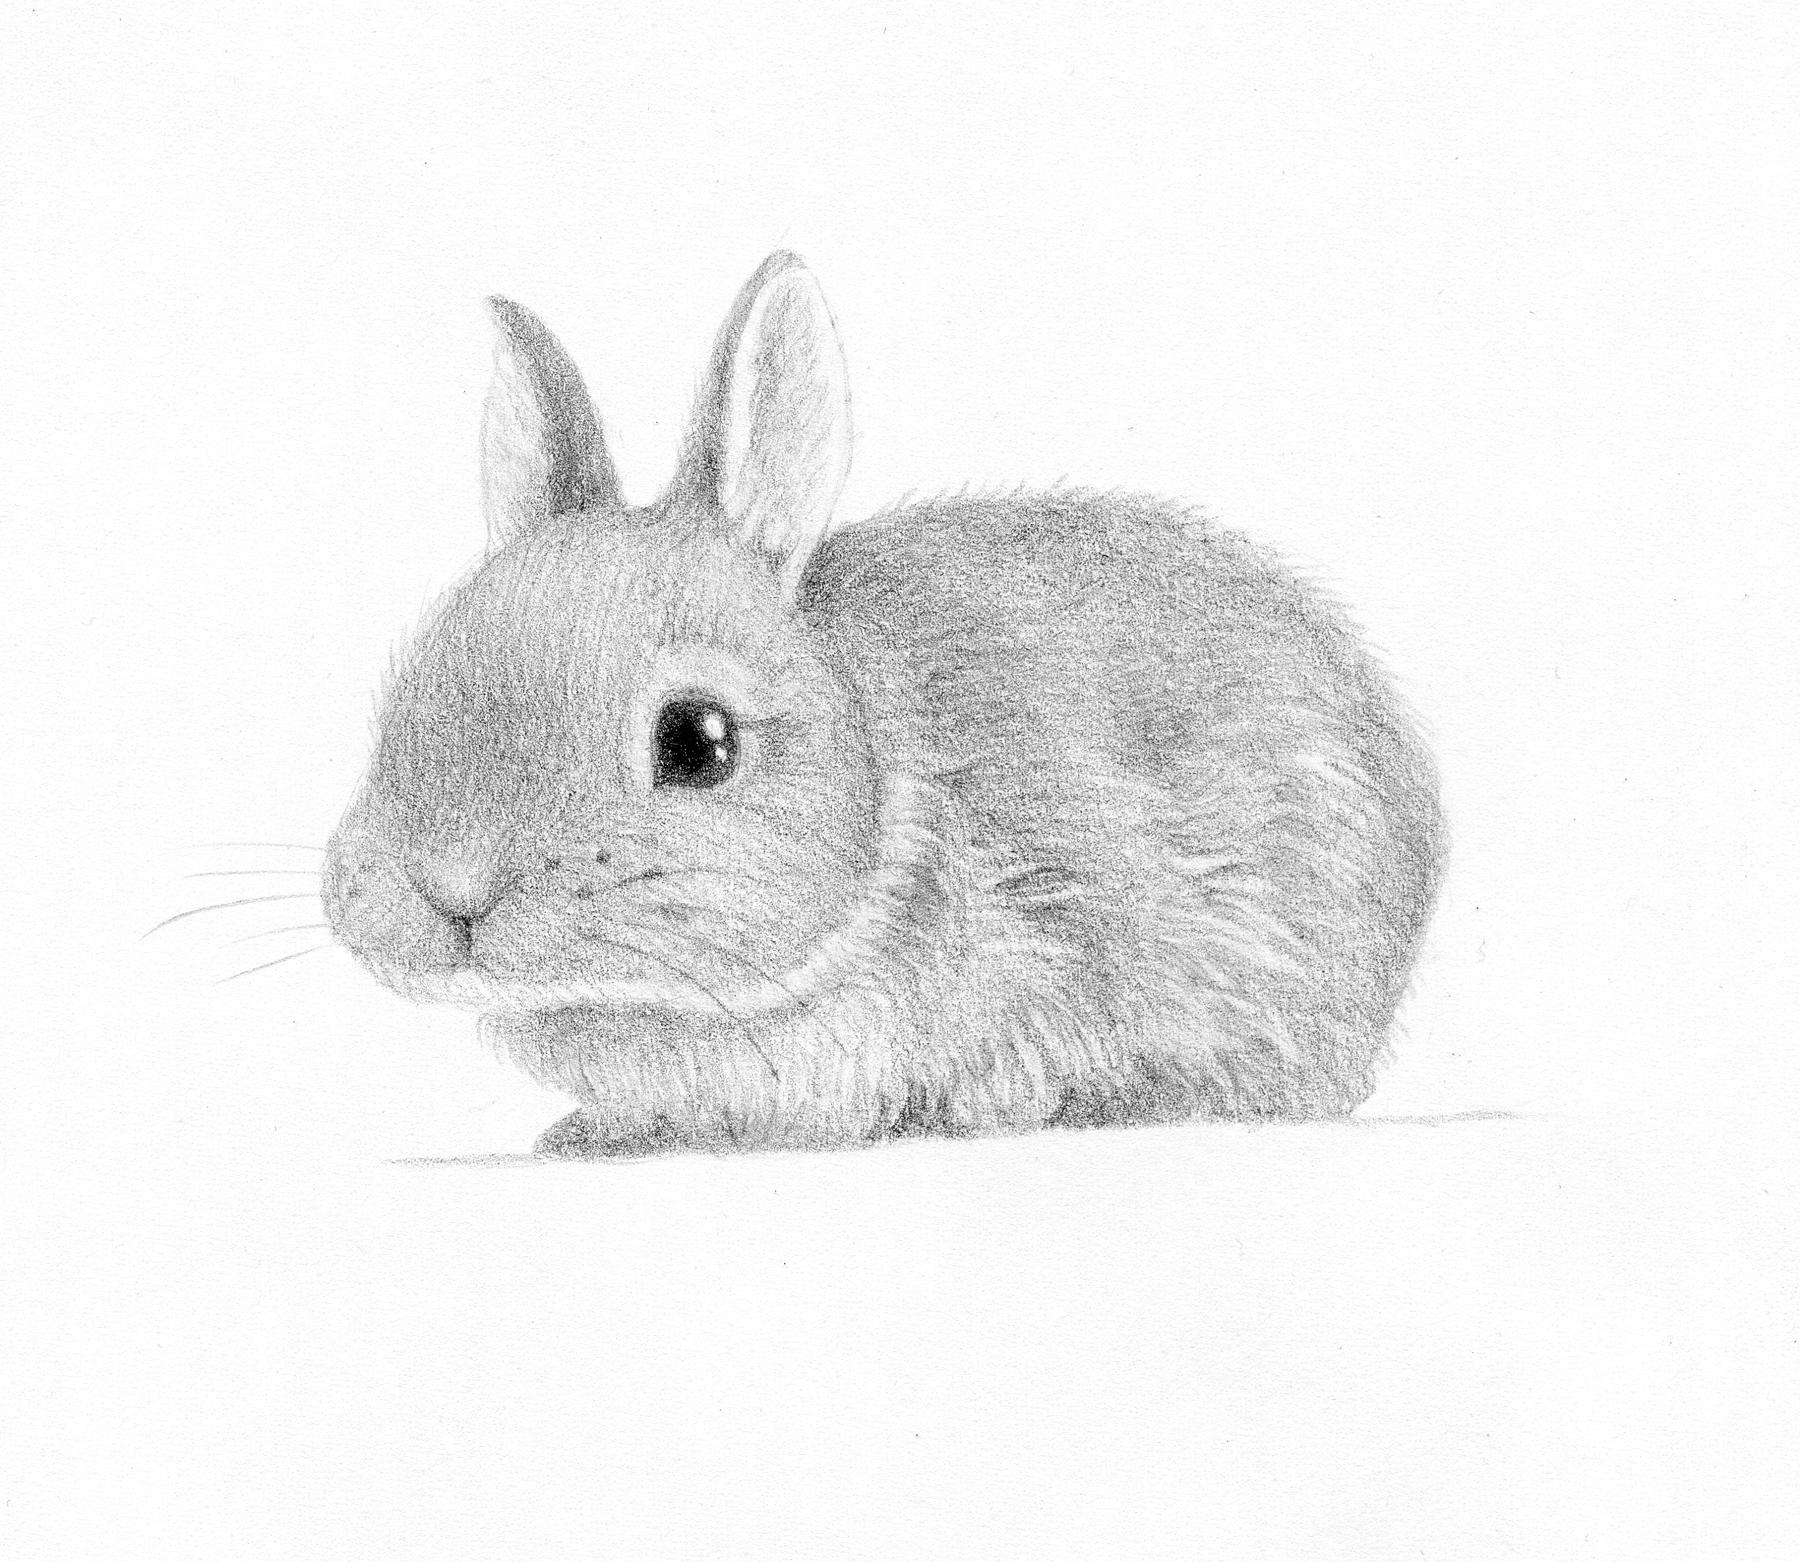 Drawn rabbid invasion Spot bunny